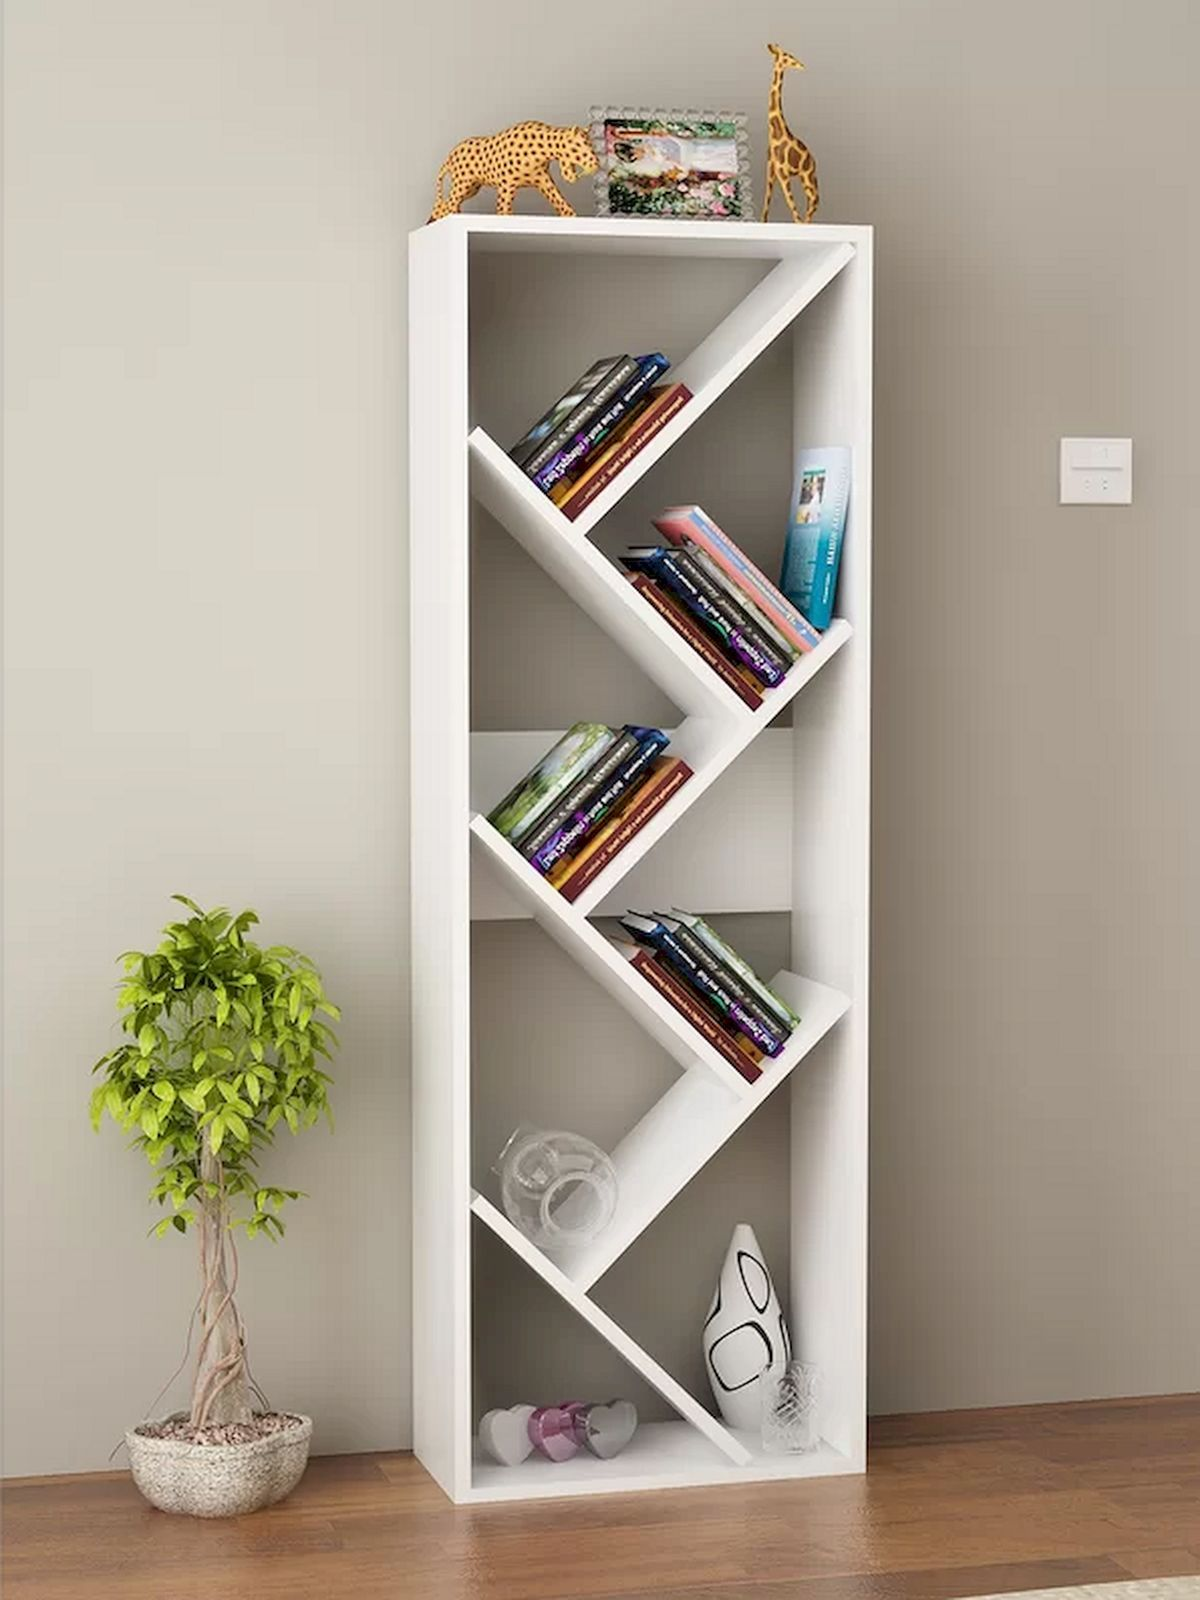 10 Awesome Diy Bookshelf Design Ideas Anyone Can Do Itself Dexorate Bookcase Decor Diy Bookshelf Design Creative Bookshelves